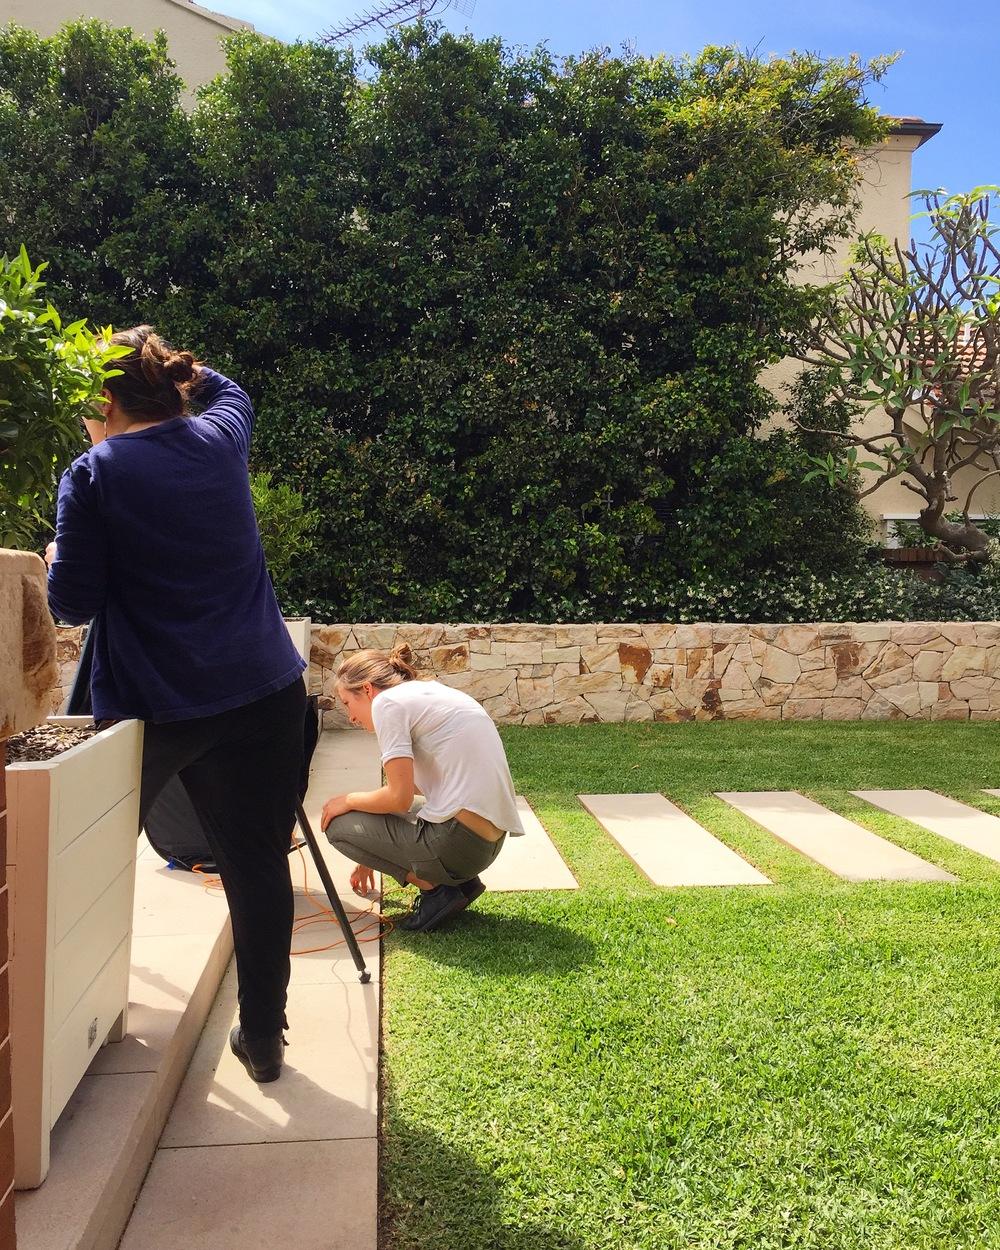 Landscape Design, Construction and Garden Maintenance by Outdoor Establishments